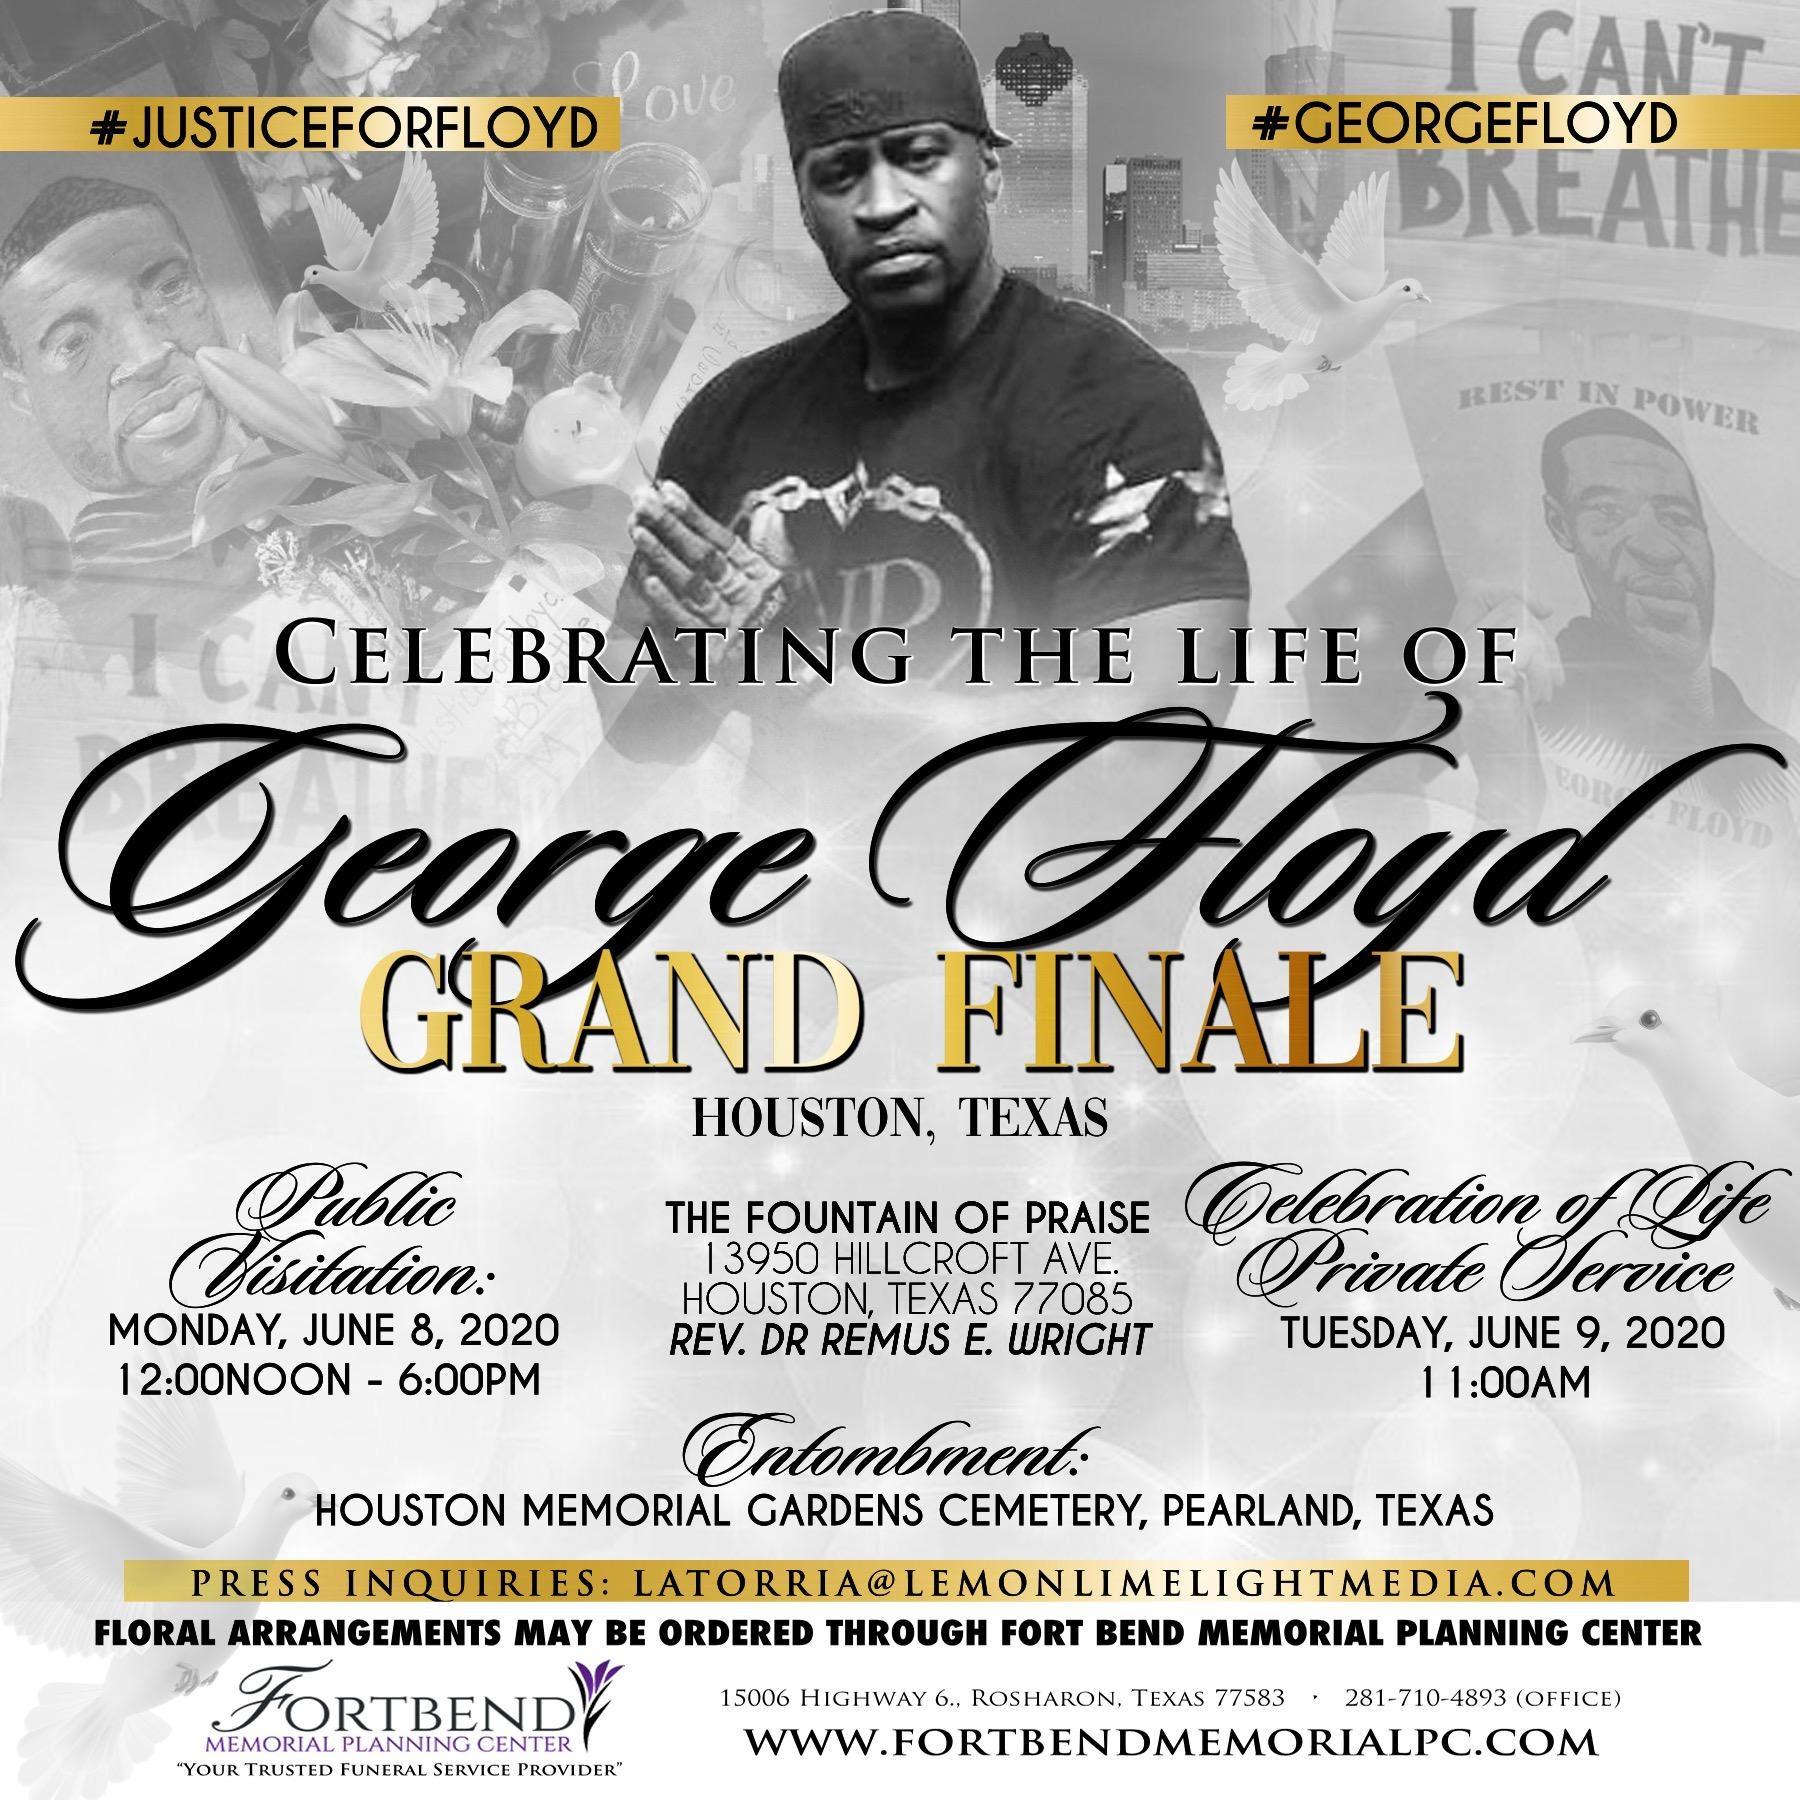 Details On The Celebration Of Life In Houston For George Floyd Afram News